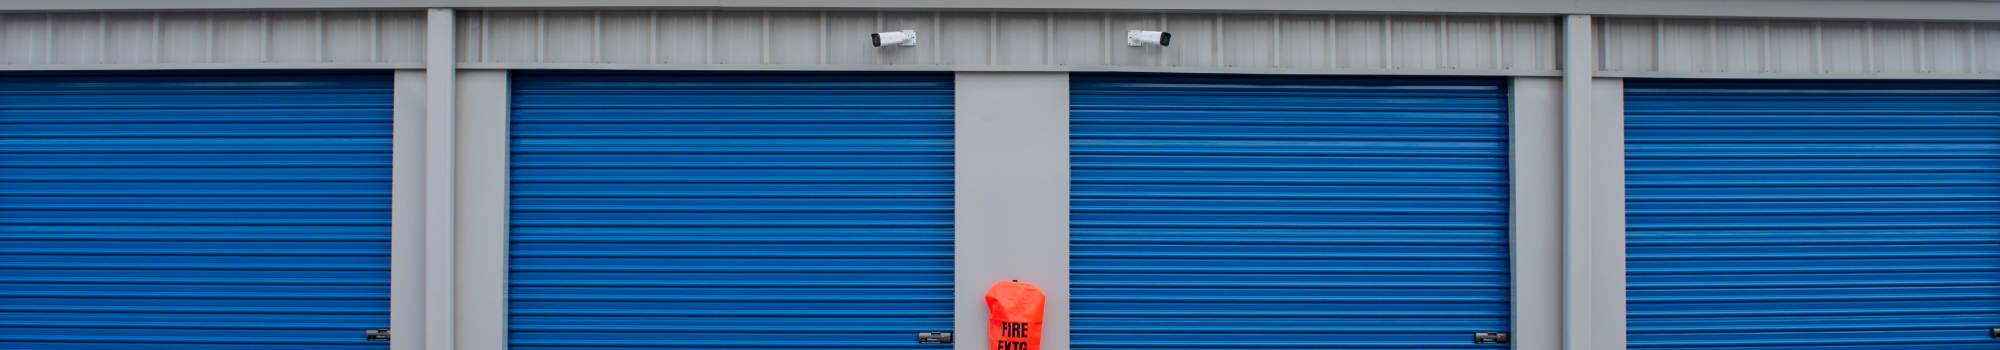 Outdoor storage at Atlantic Self Storage in Jacksonville, Florida